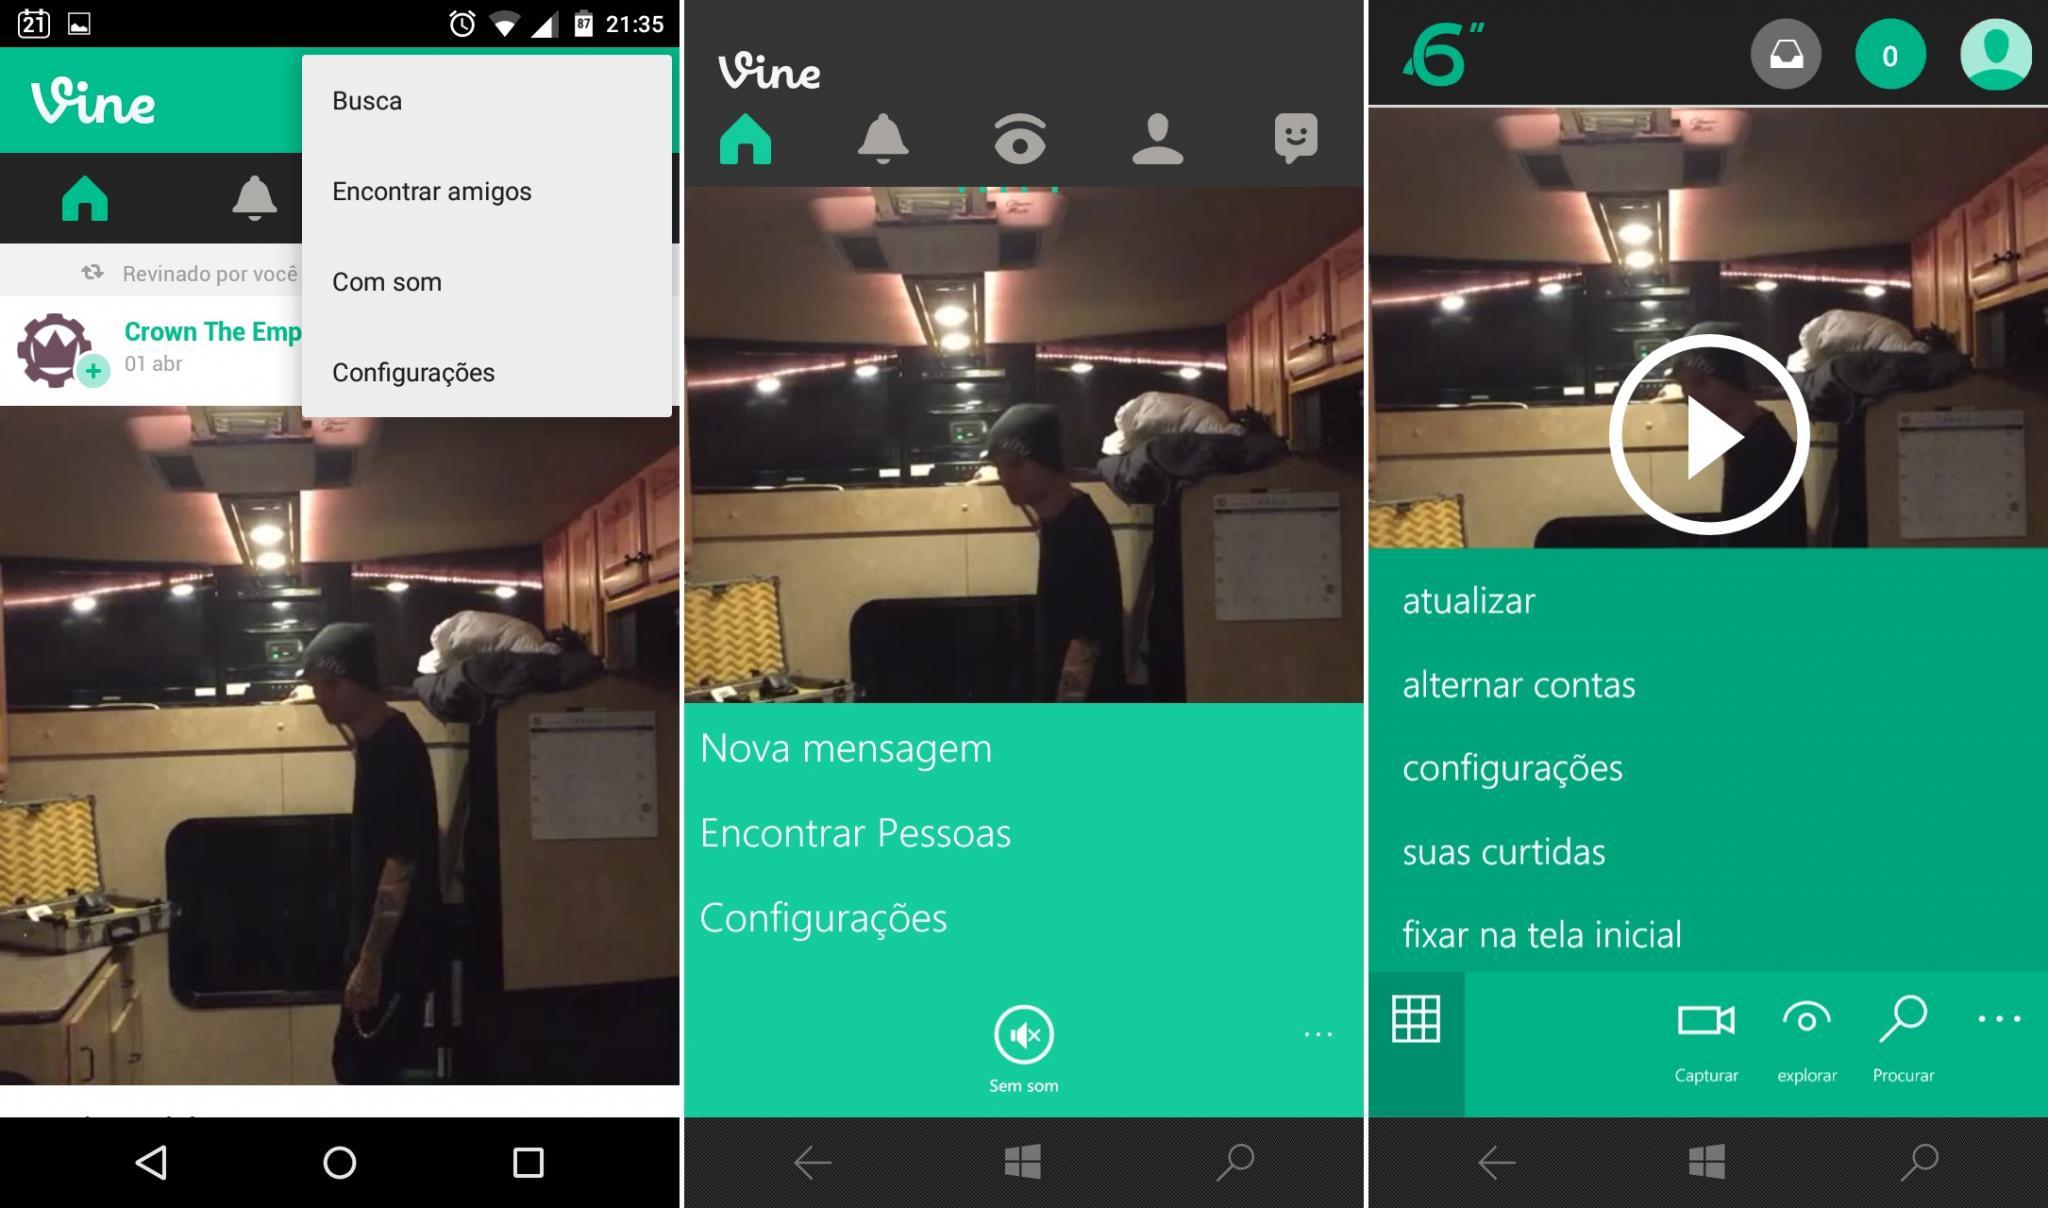 Comparativo de apps #10 - vine -4